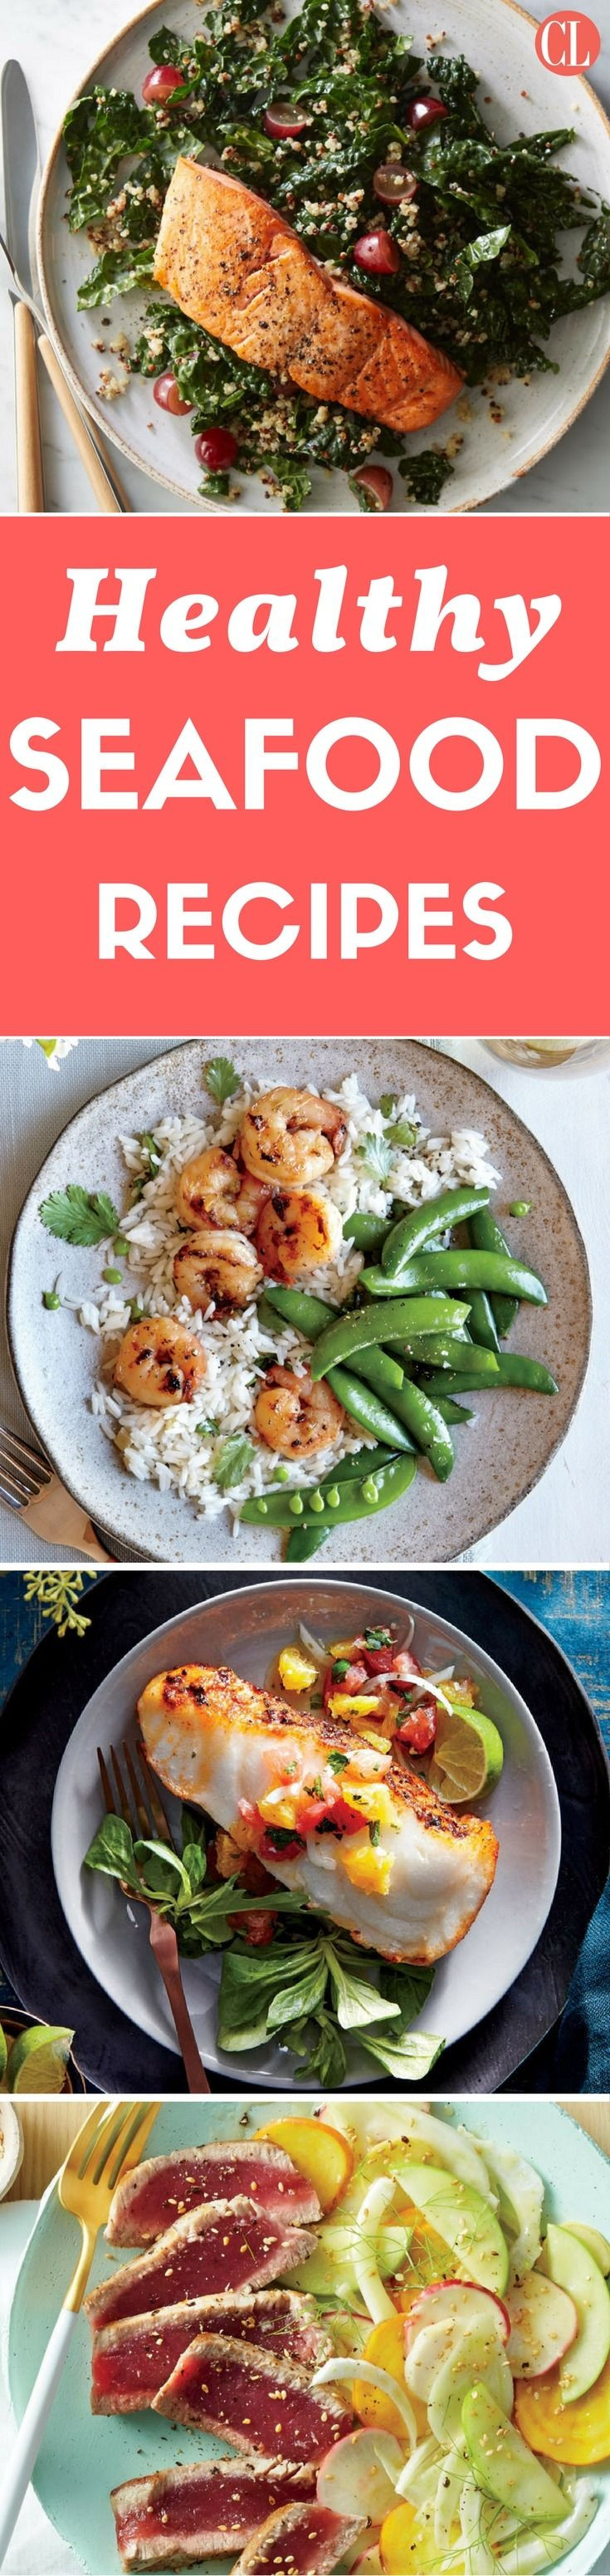 Heart Healthy Shrimp Recipes  The 25 best Heart healthy t ideas on Pinterest